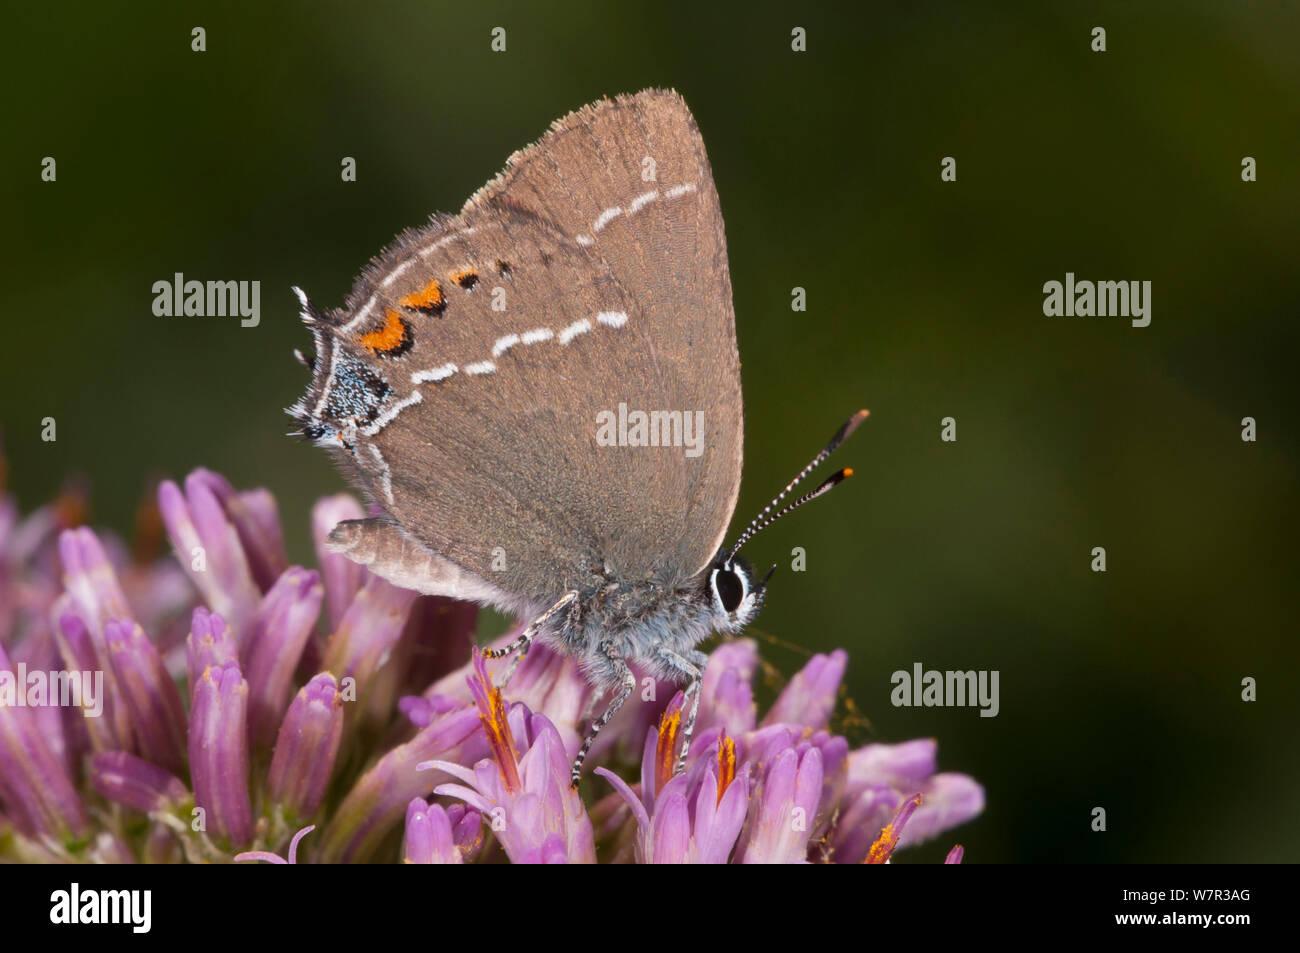 Blue-spot hairstreak butterfly (Satyrium spini) feeding, Campo Imperatore, Gran Sasso, Appennines, Abruzzo, Italy Stock Photo